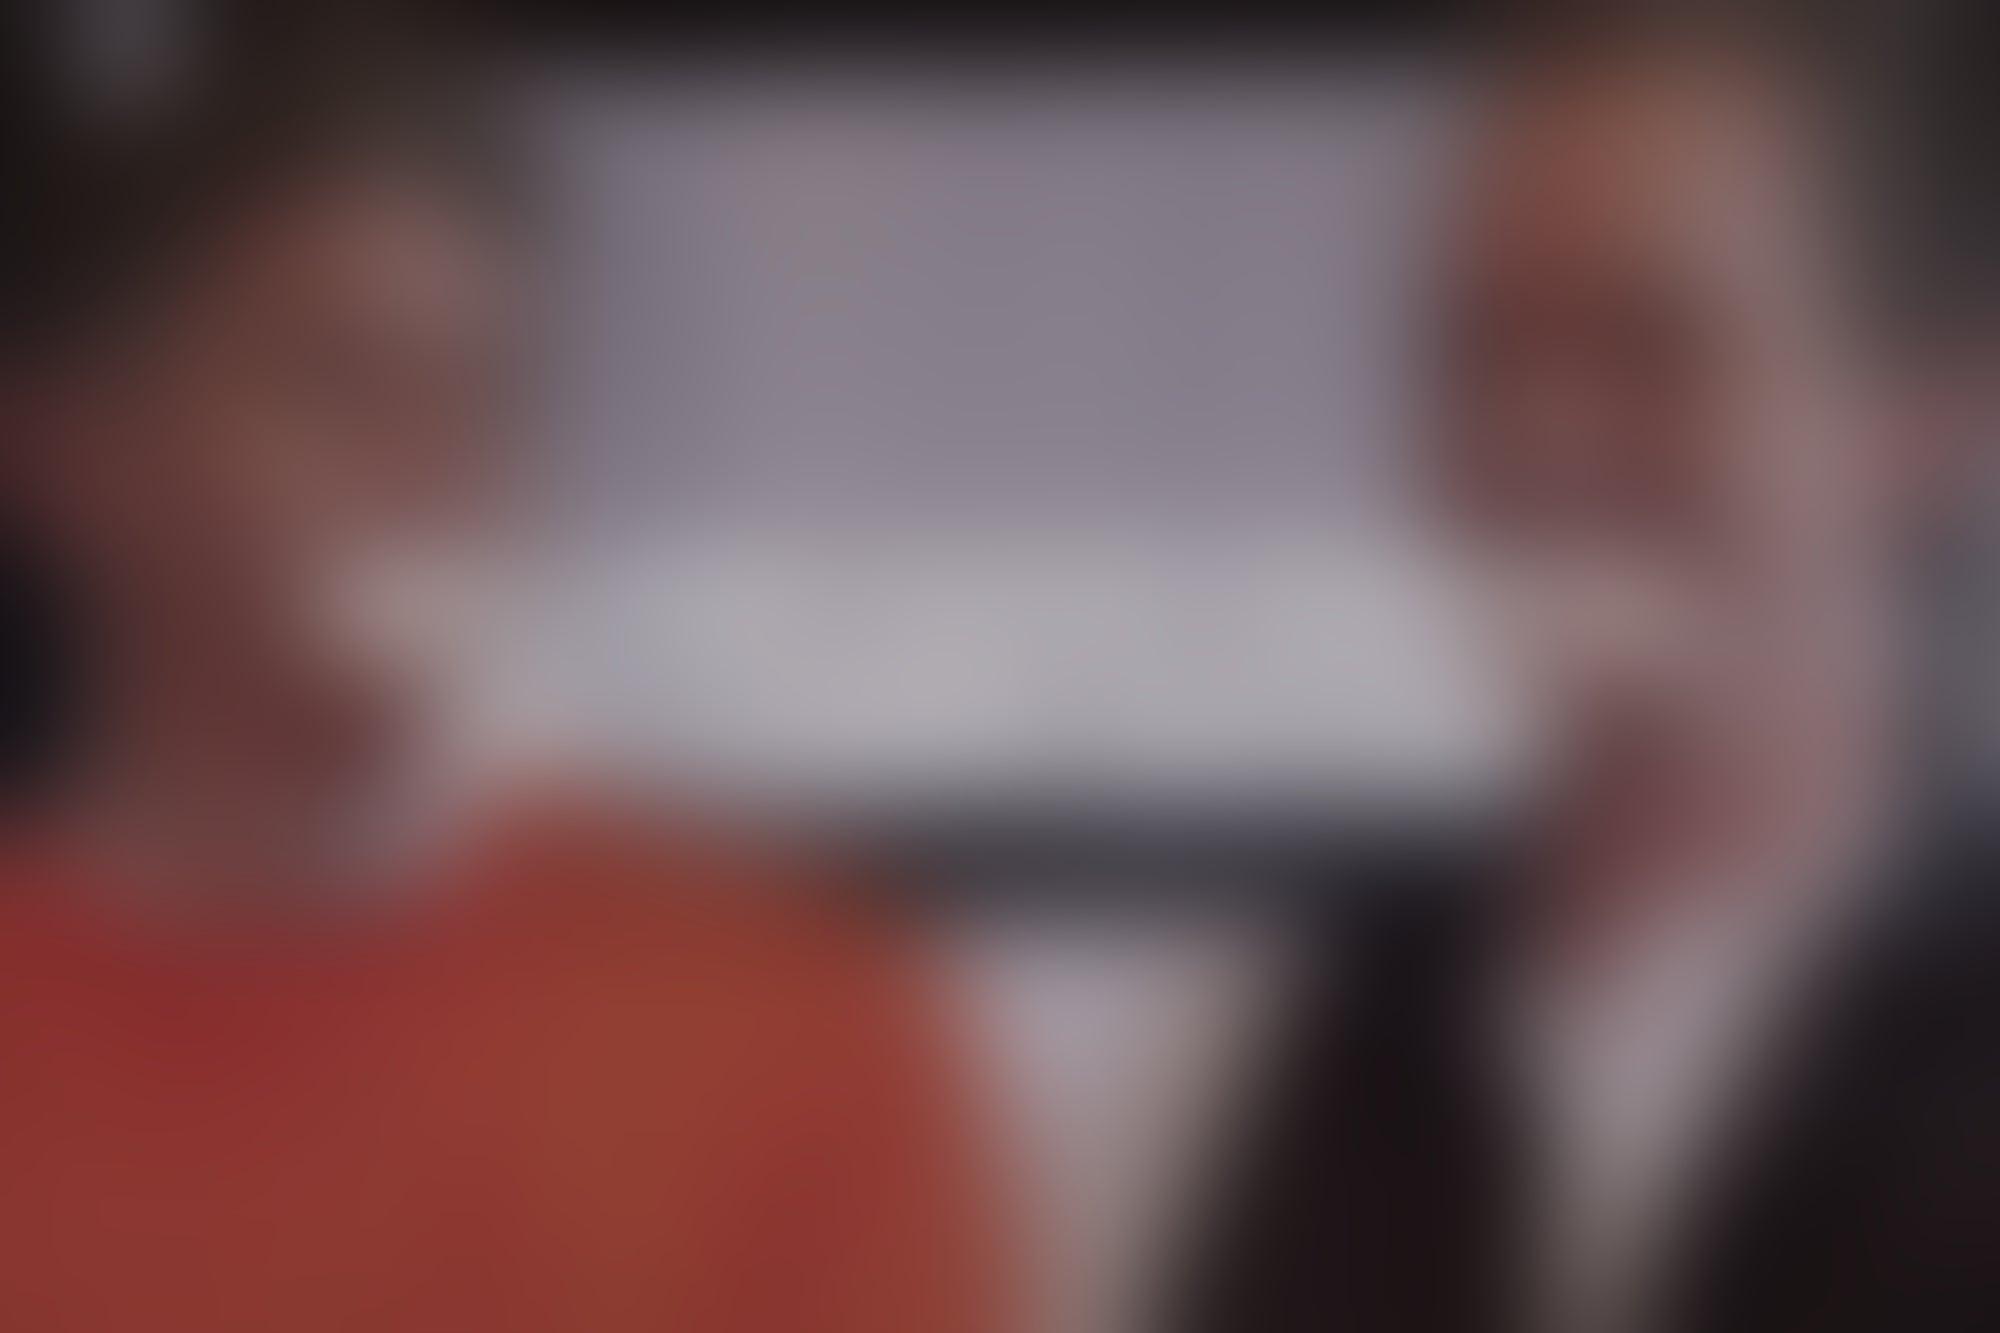 Neil Patrick Harris and David Burtka Reveal Top Tips for Career Success (Video)